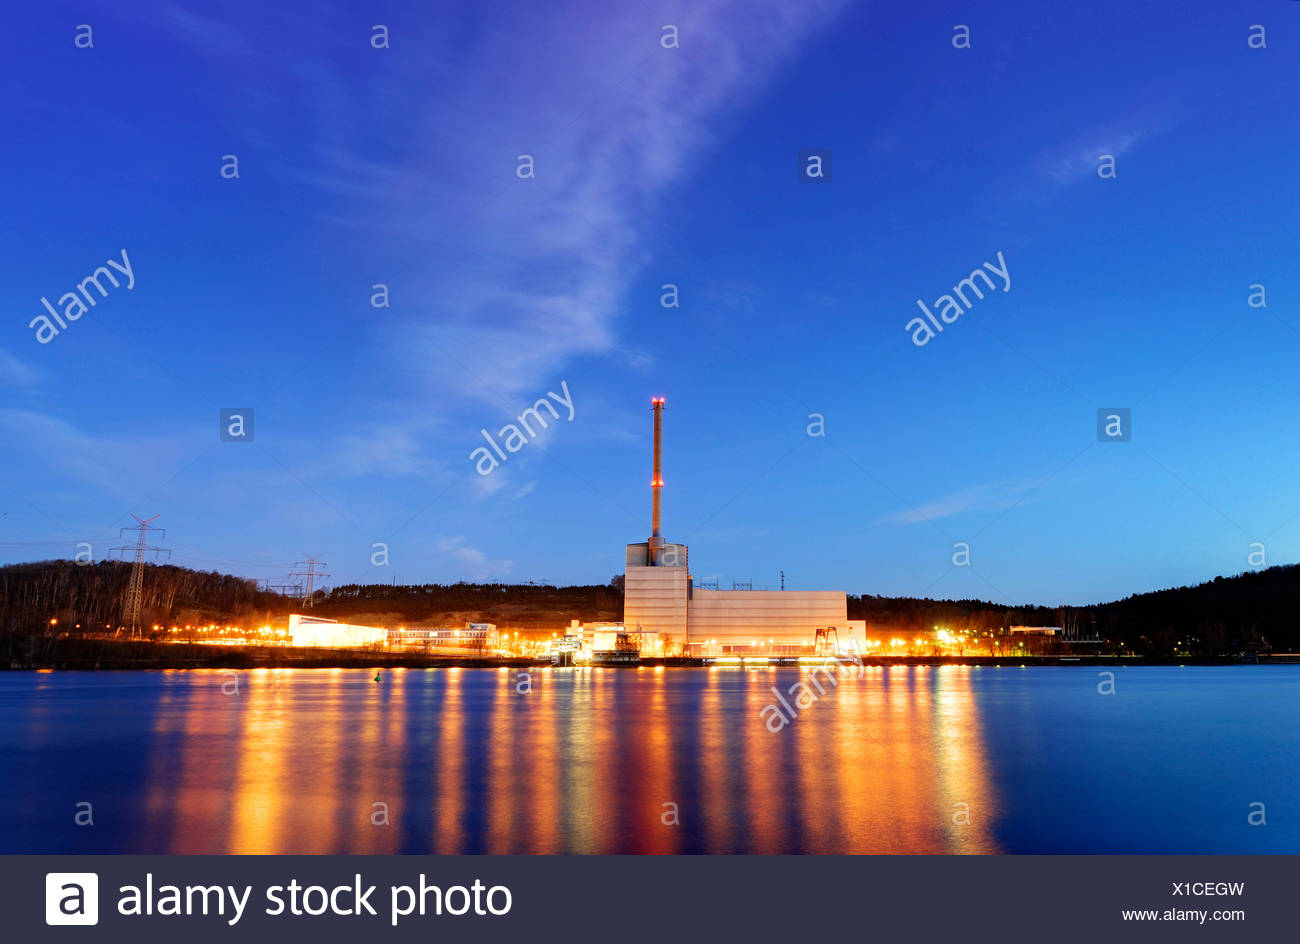 nuclear power station Kruemmel at sunset, Germany, Schleswig-Holstein - Stock Image